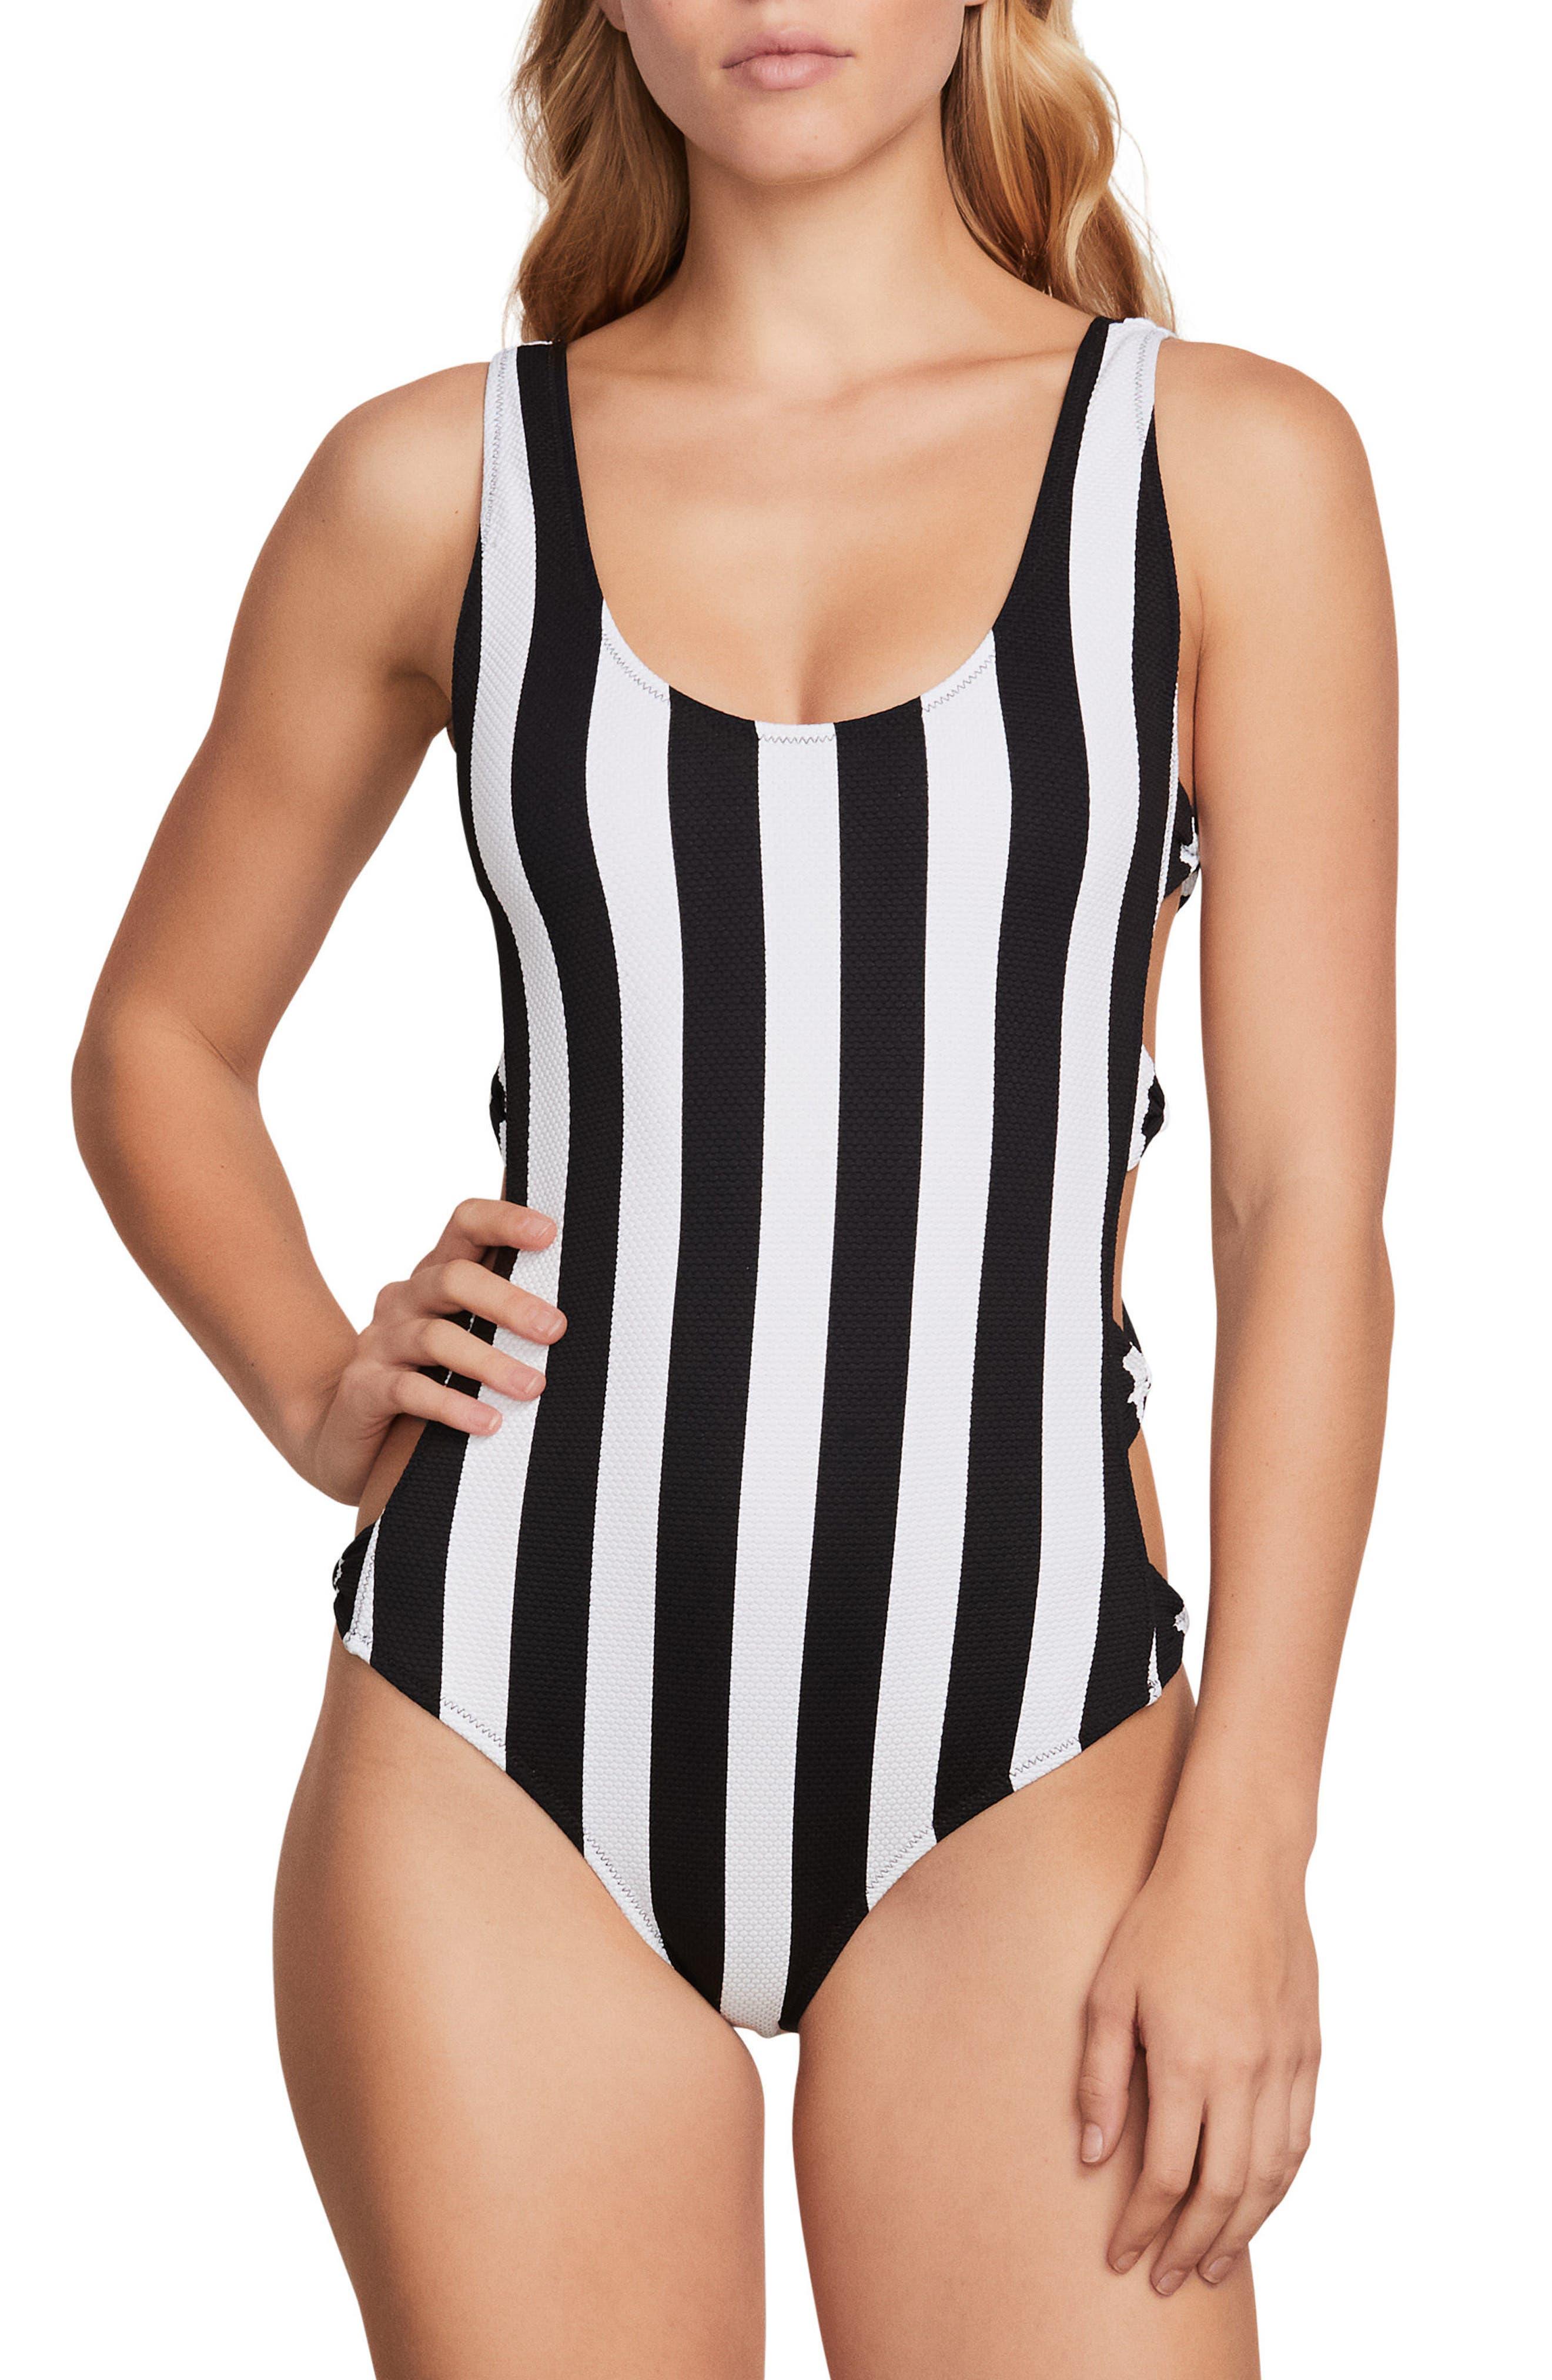 Stripe Club One-Piece Swimsuit,                             Main thumbnail 1, color,                             001